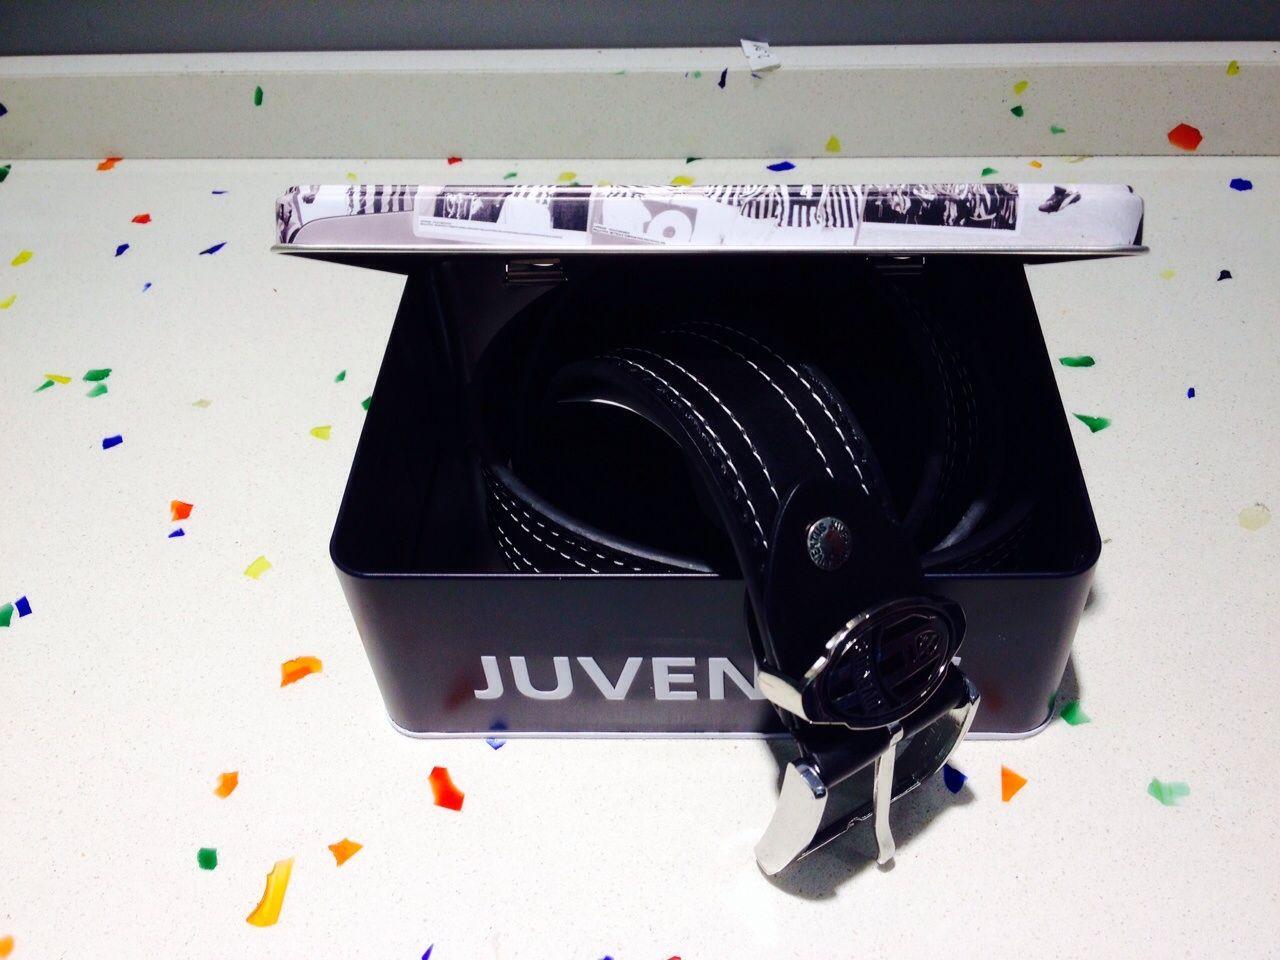 Cintura Uomo/Originale #Juventus #rigorosamente #LowCost solo da #MigliardiStore 21,90 euro